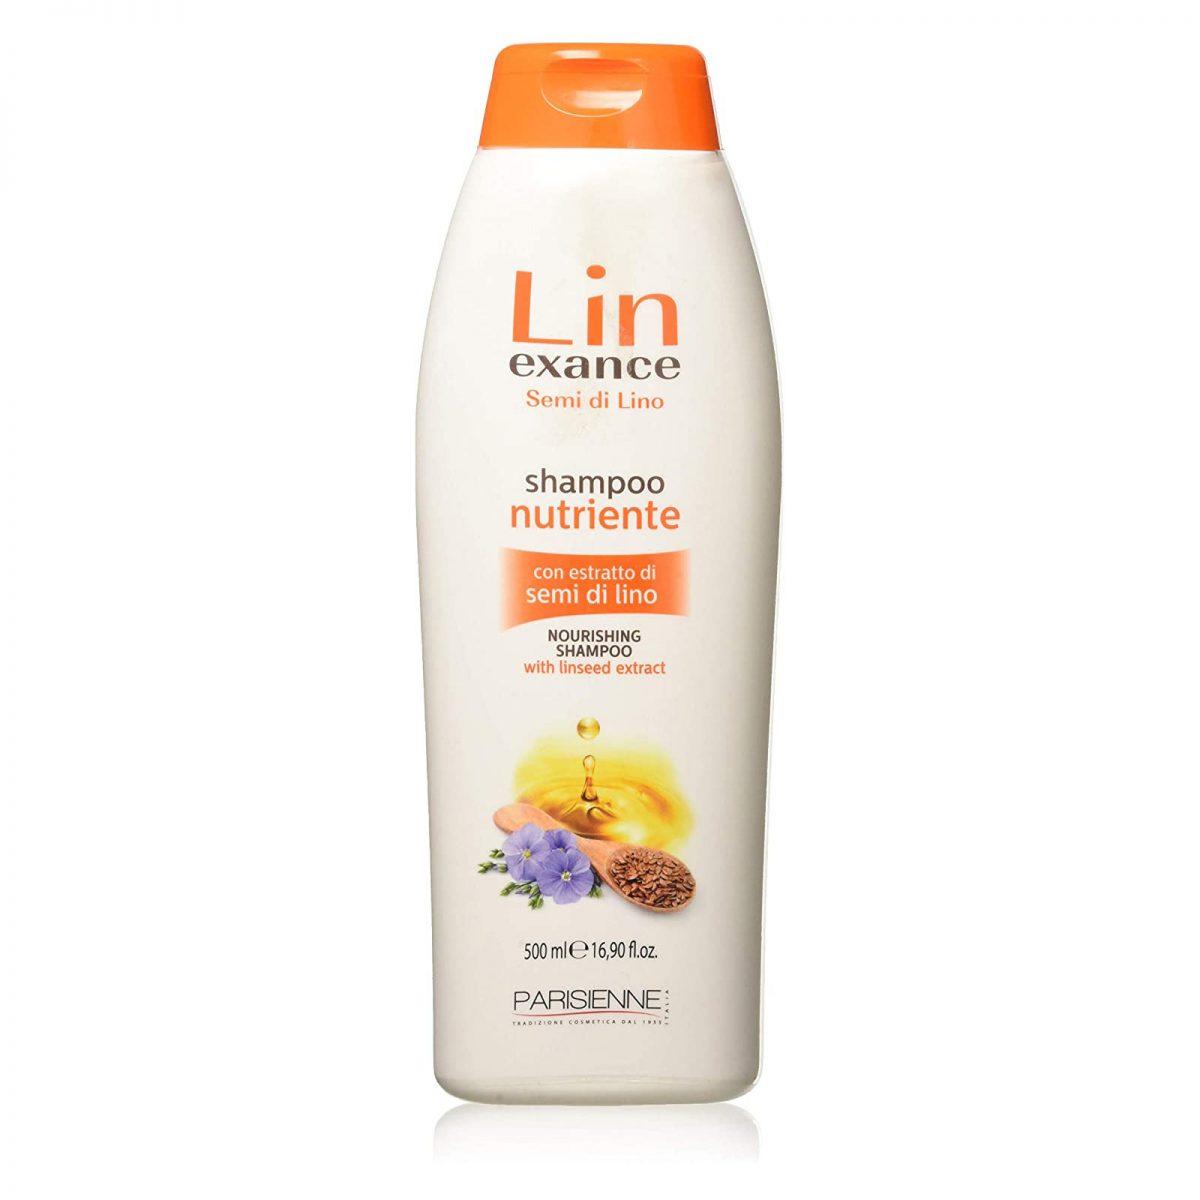 Shampoo Semi di lino Tutti tipi di capelli Parisienne